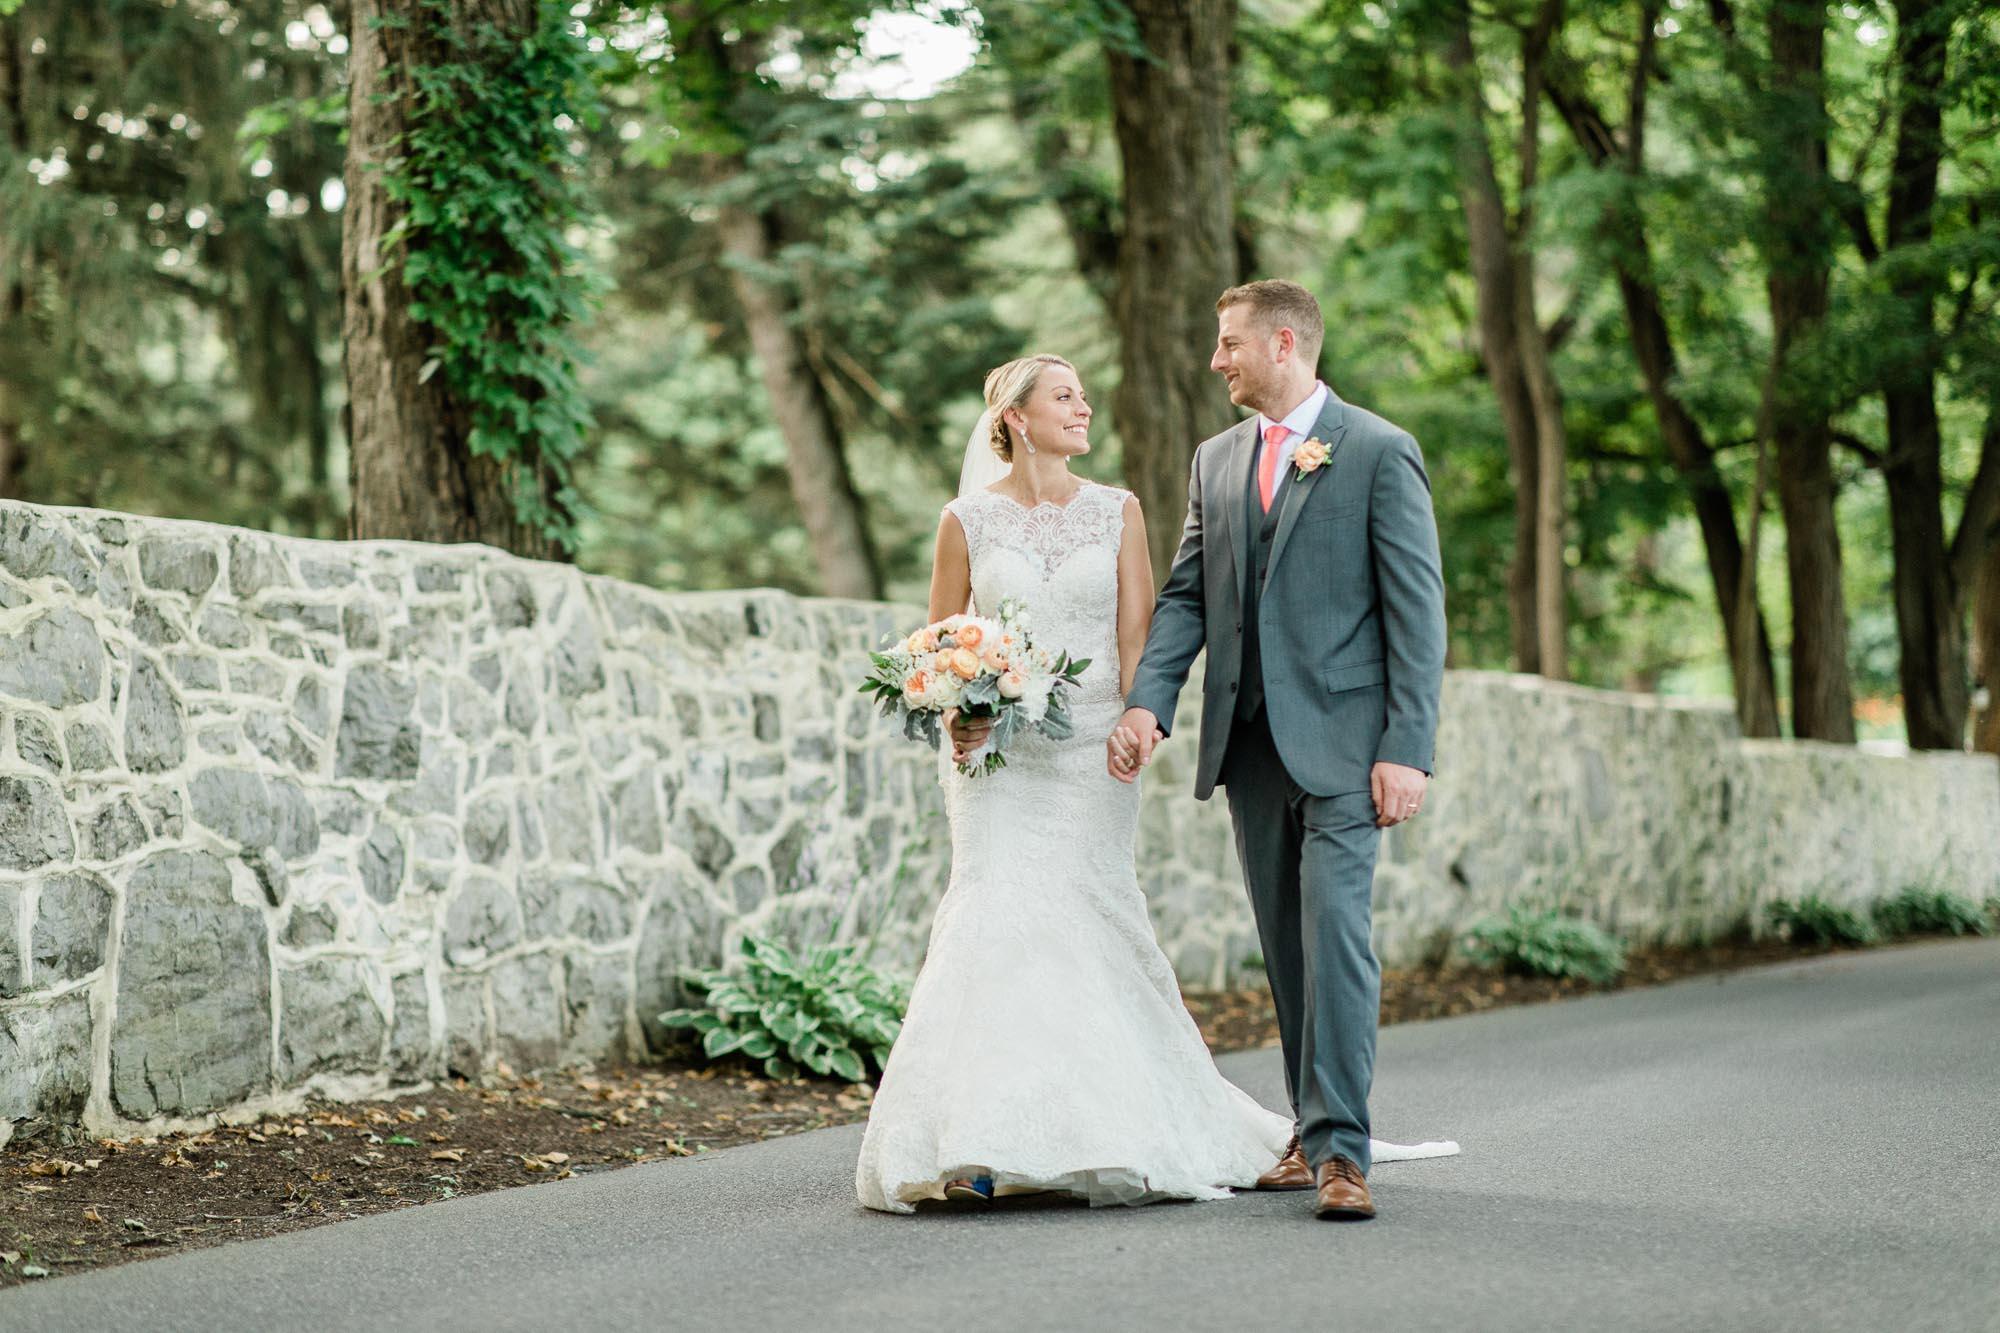 Allenberry-resort-historic-pennsylvania-wedding-22243.jpg